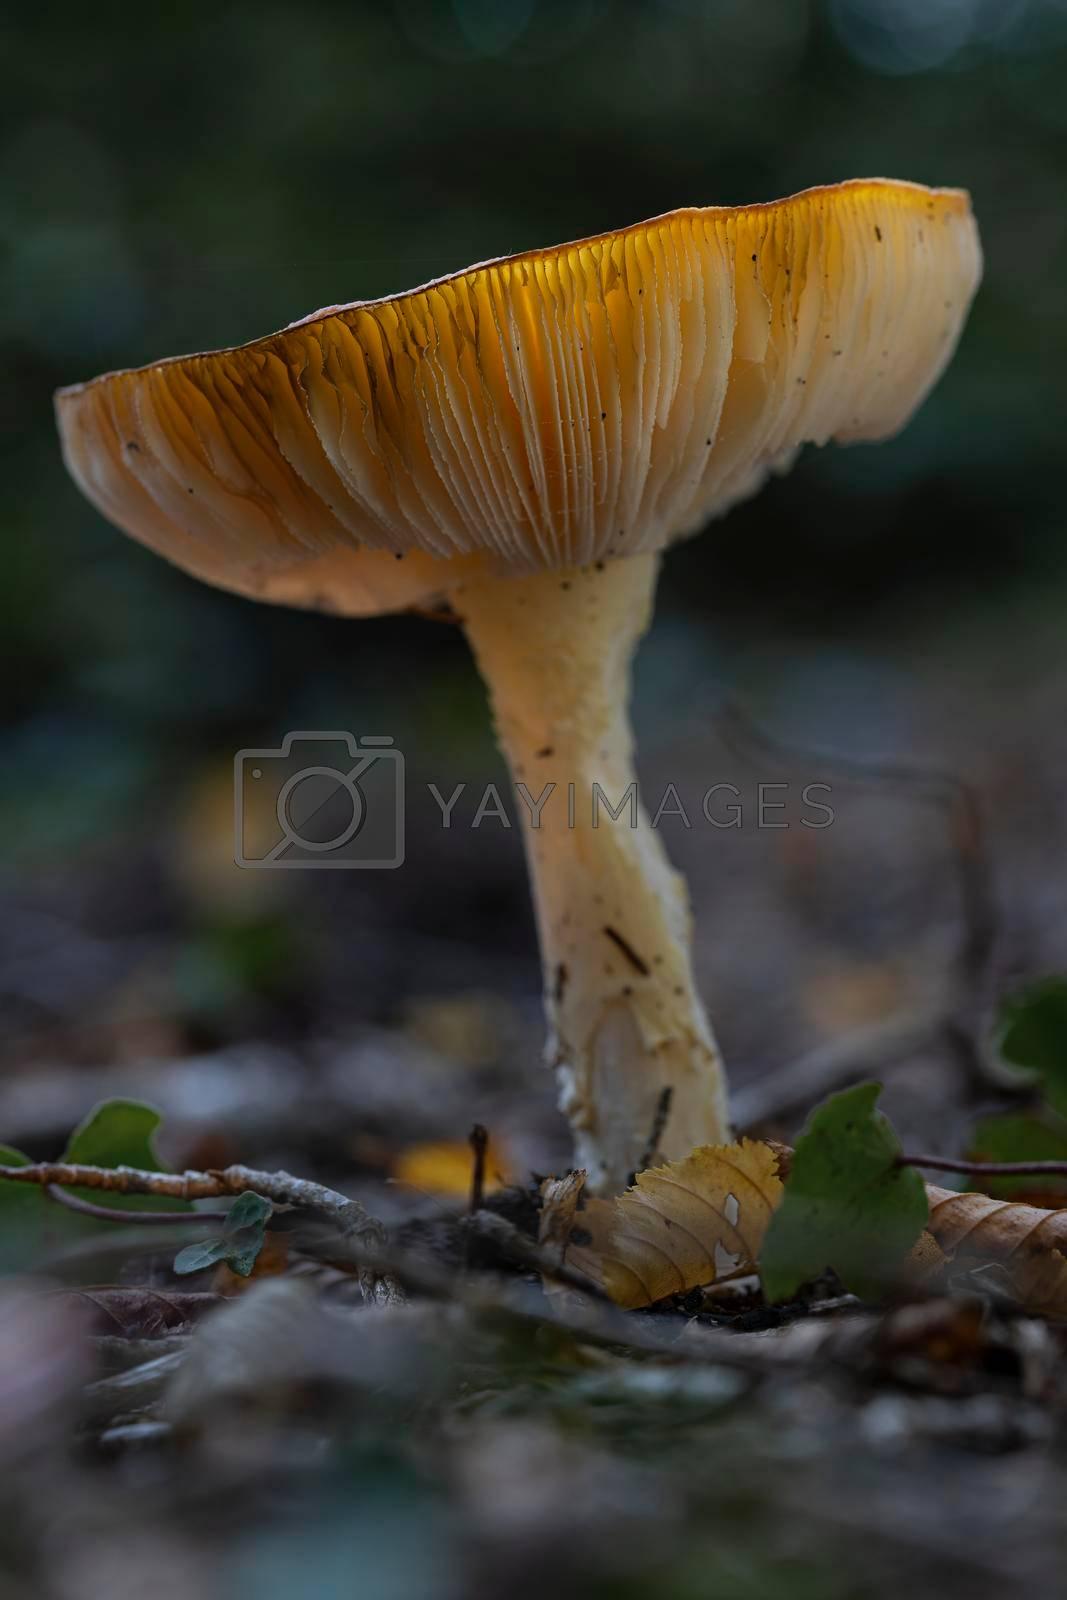 Royalty free image of Mushroom yellow white Russula ochroleuca  by Tofotografie